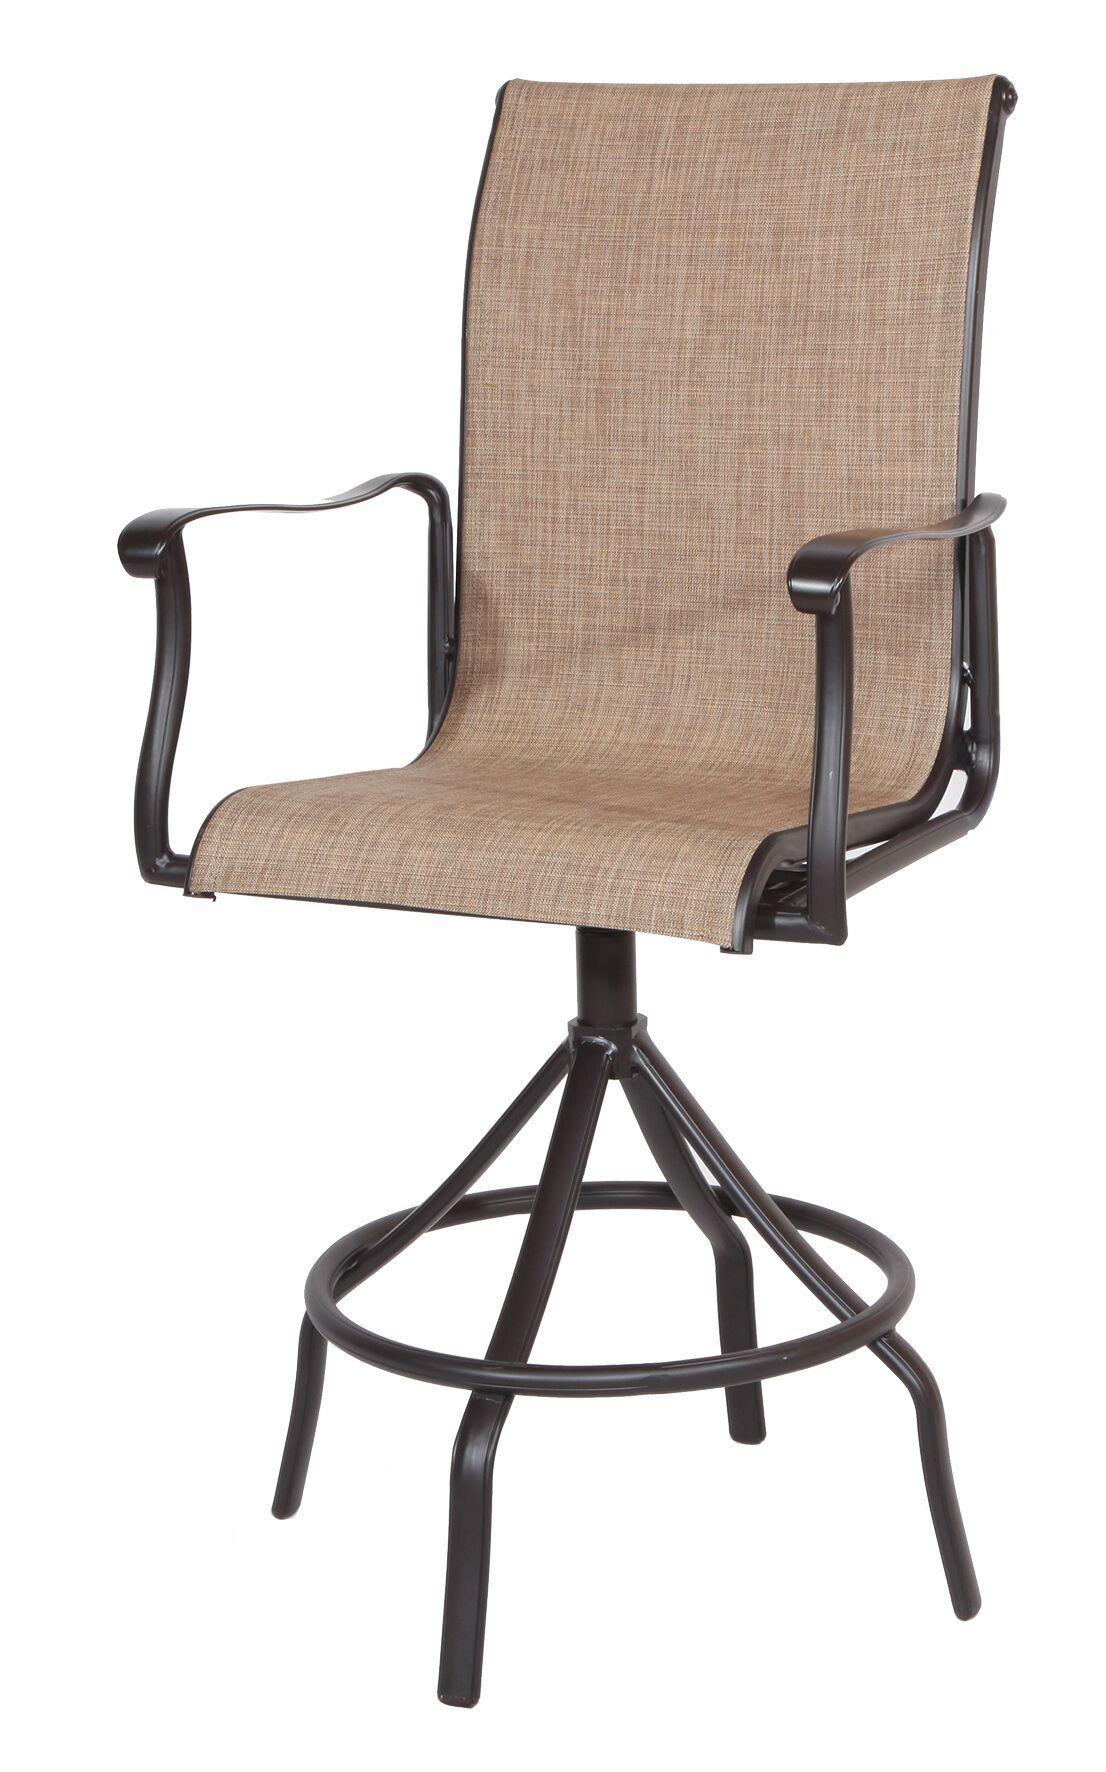 recalled.chair_1486074329259.jpg